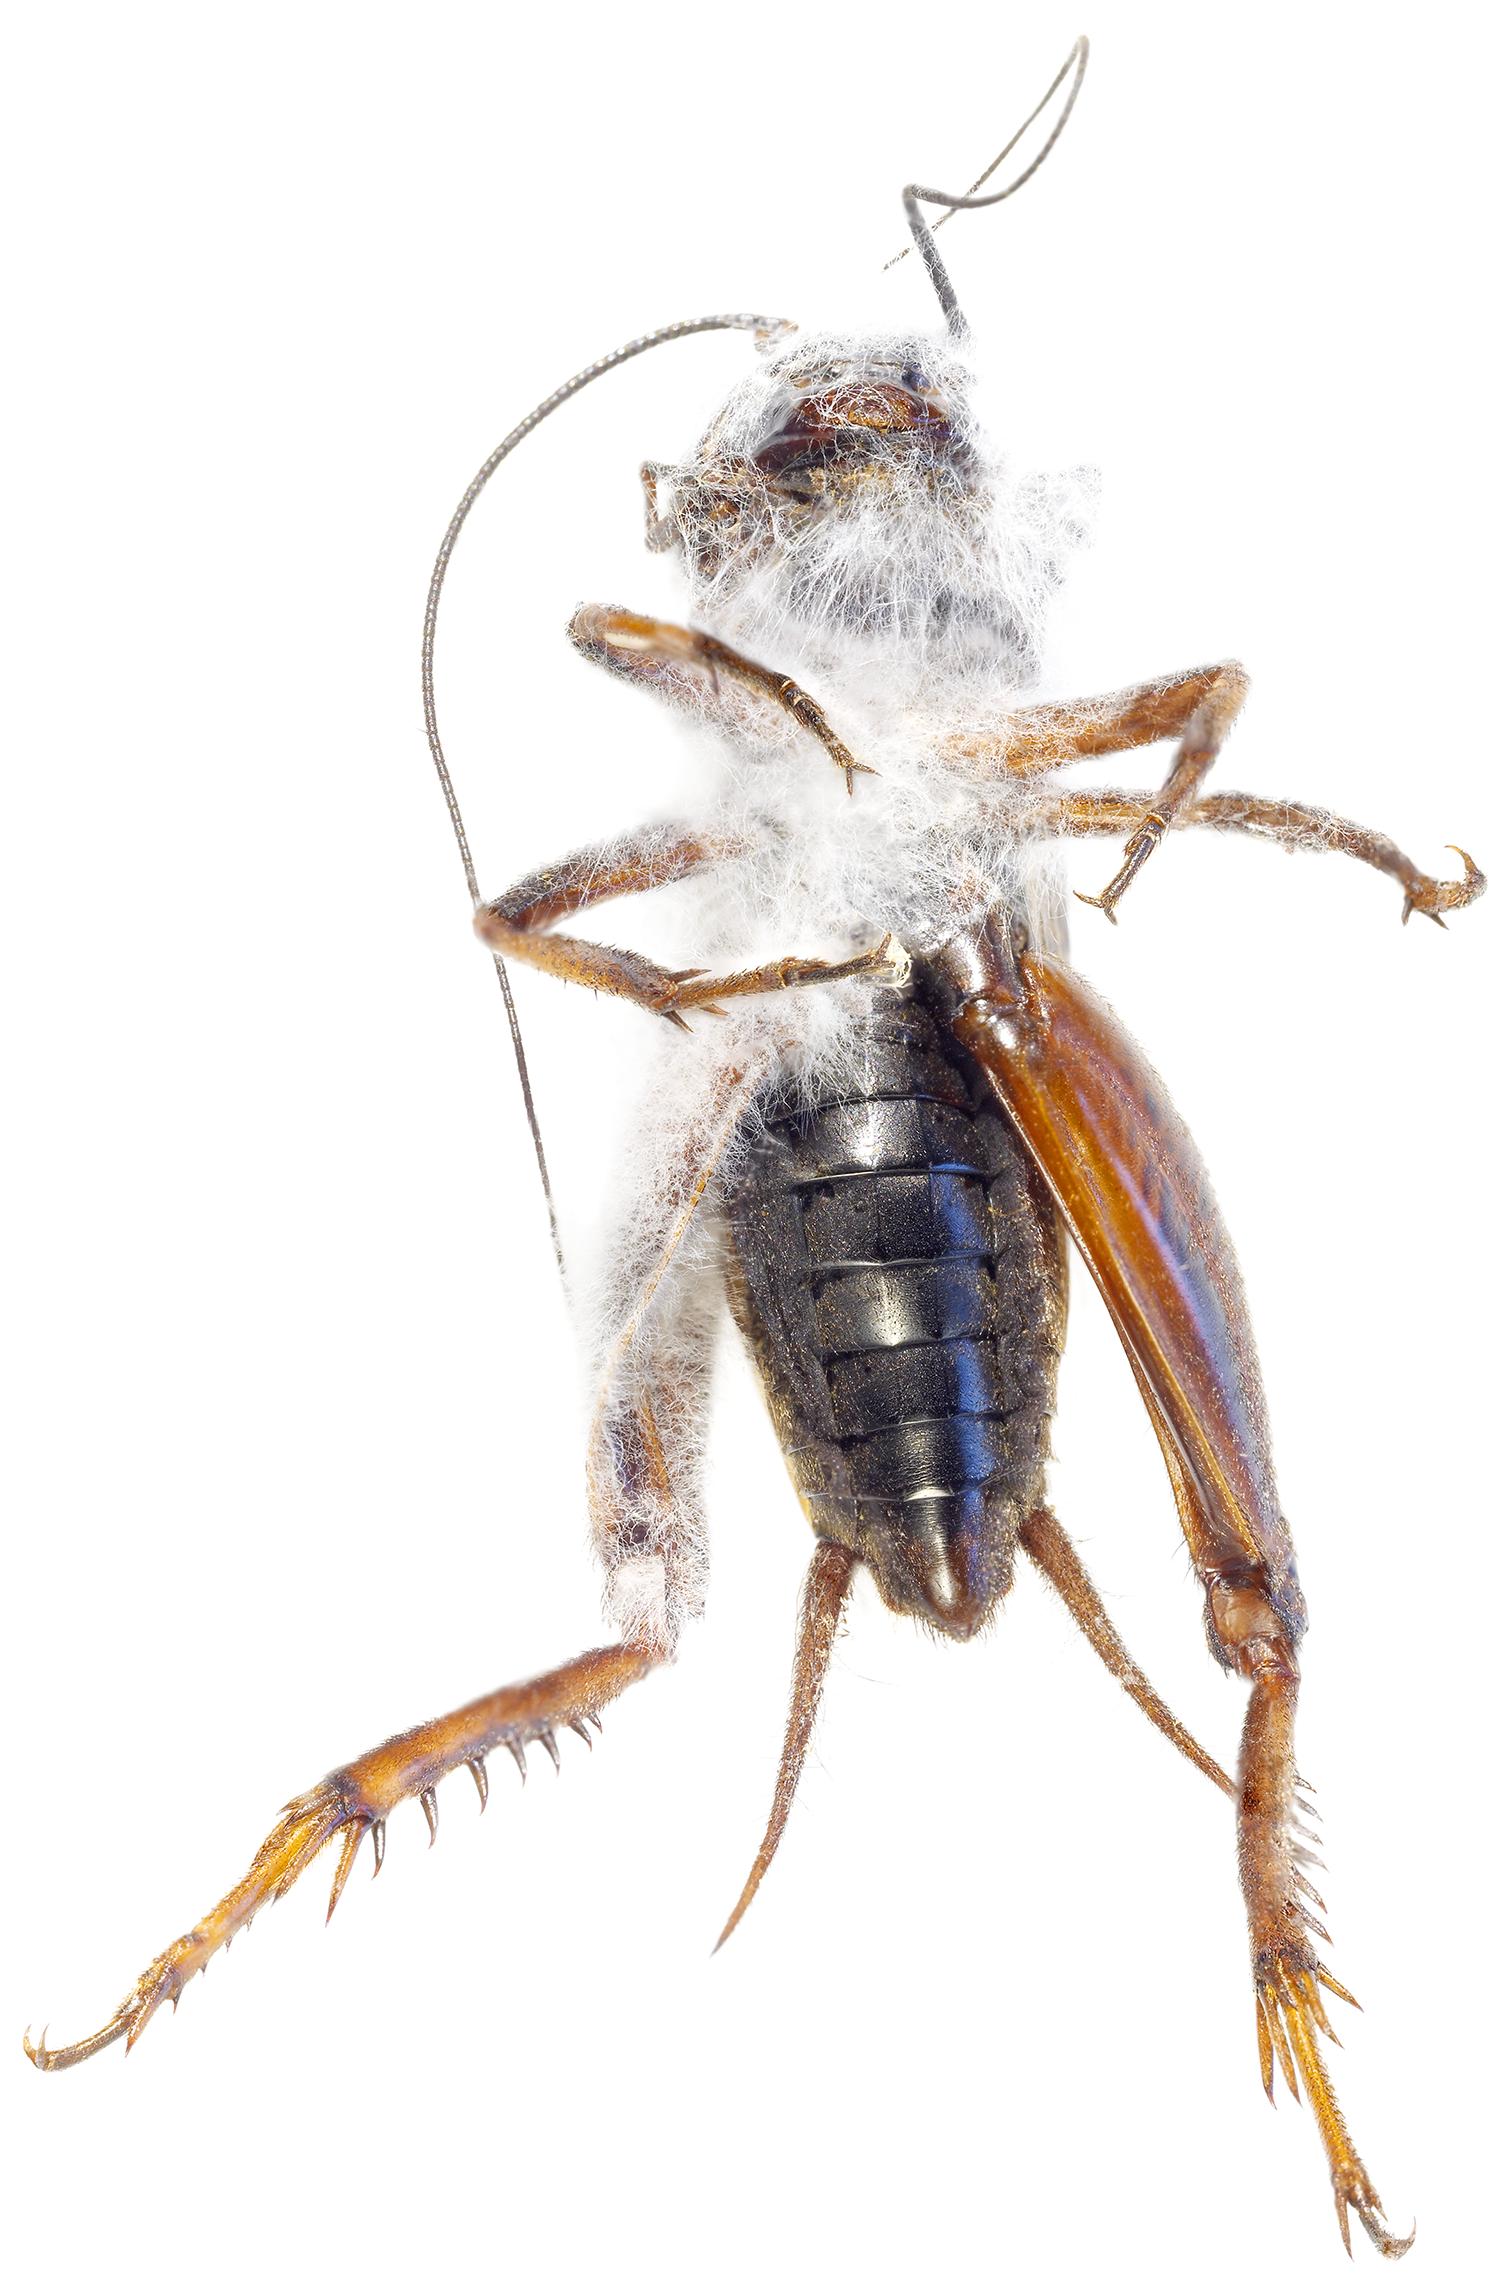 Gryllid Cricket with Oomiceti